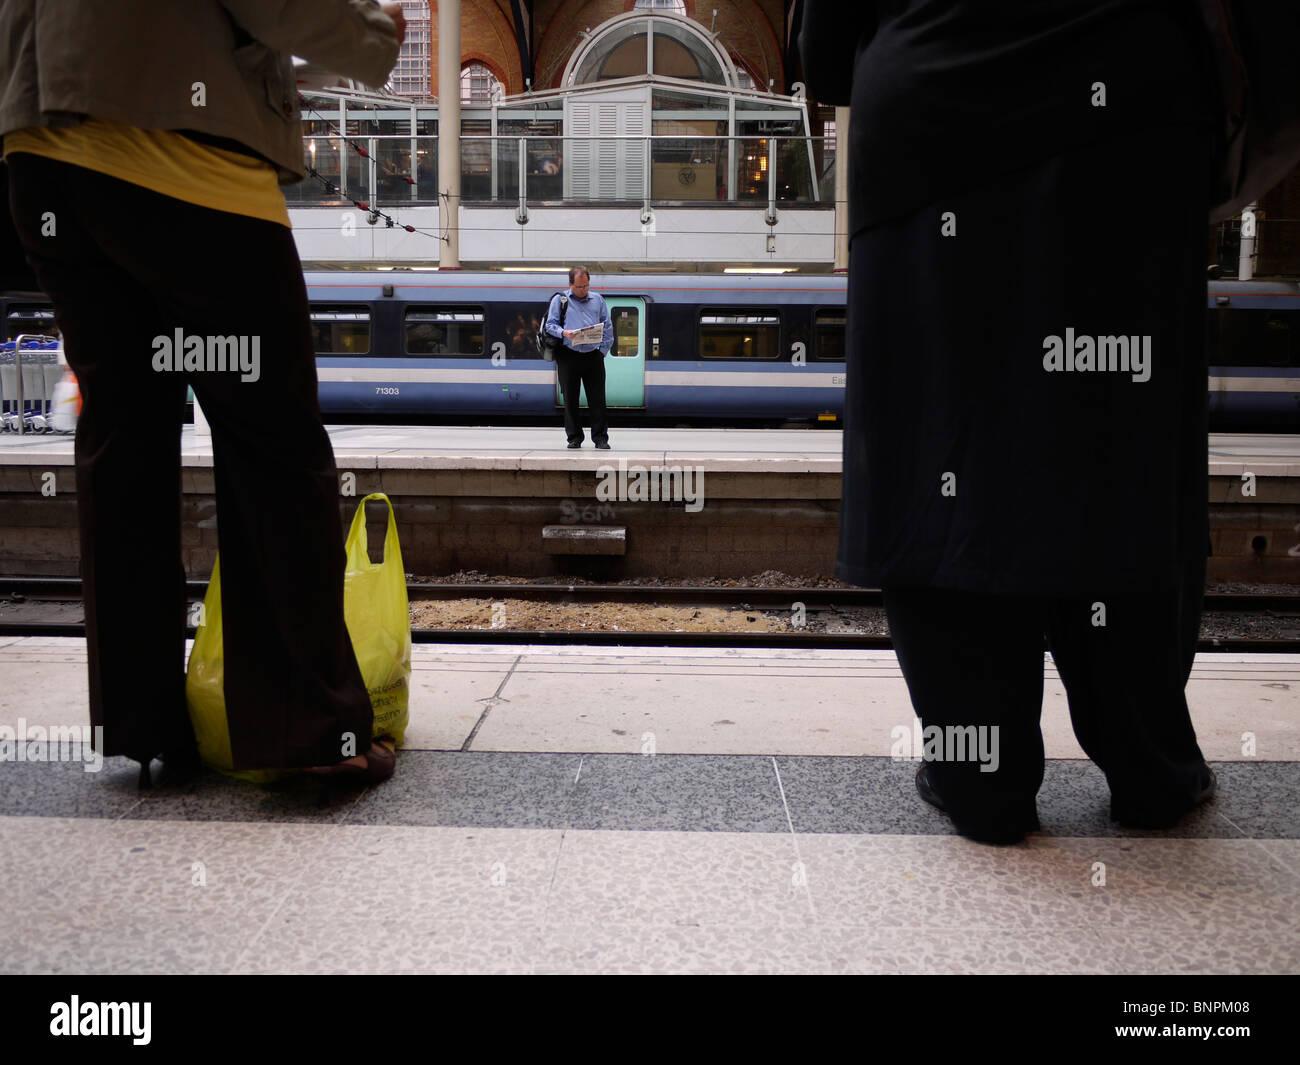 rail passengers waiting on platform at liverpool street station - Stock Image